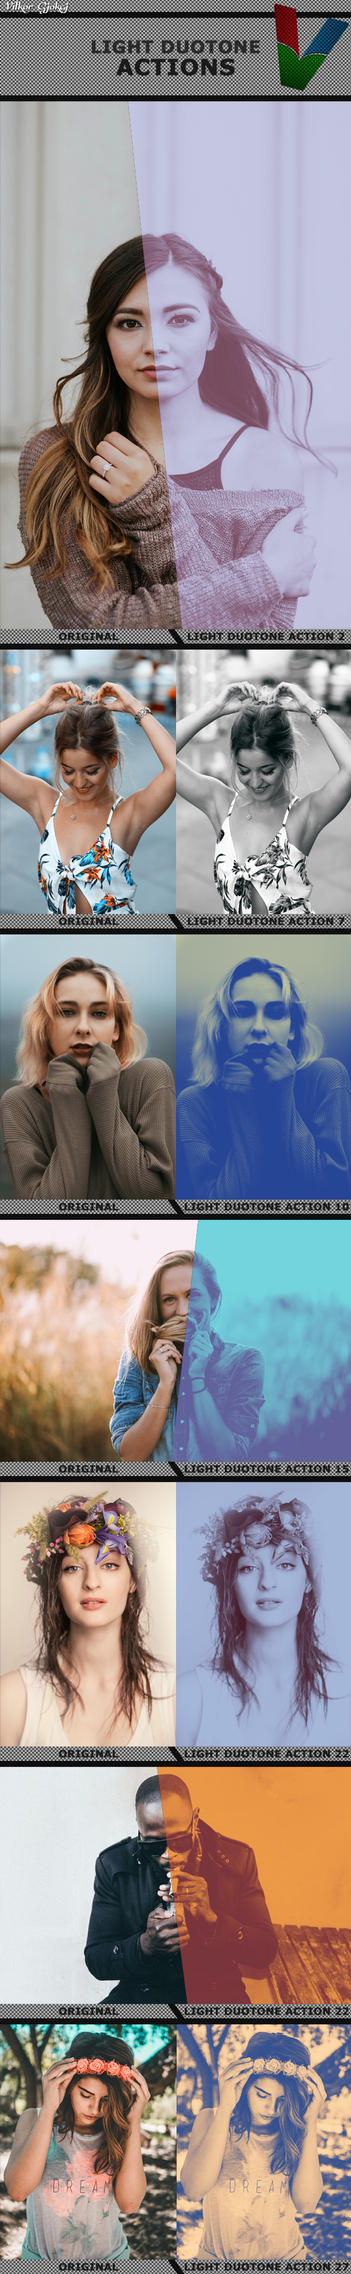 30 Duotone Actions by ViktorGjokaj